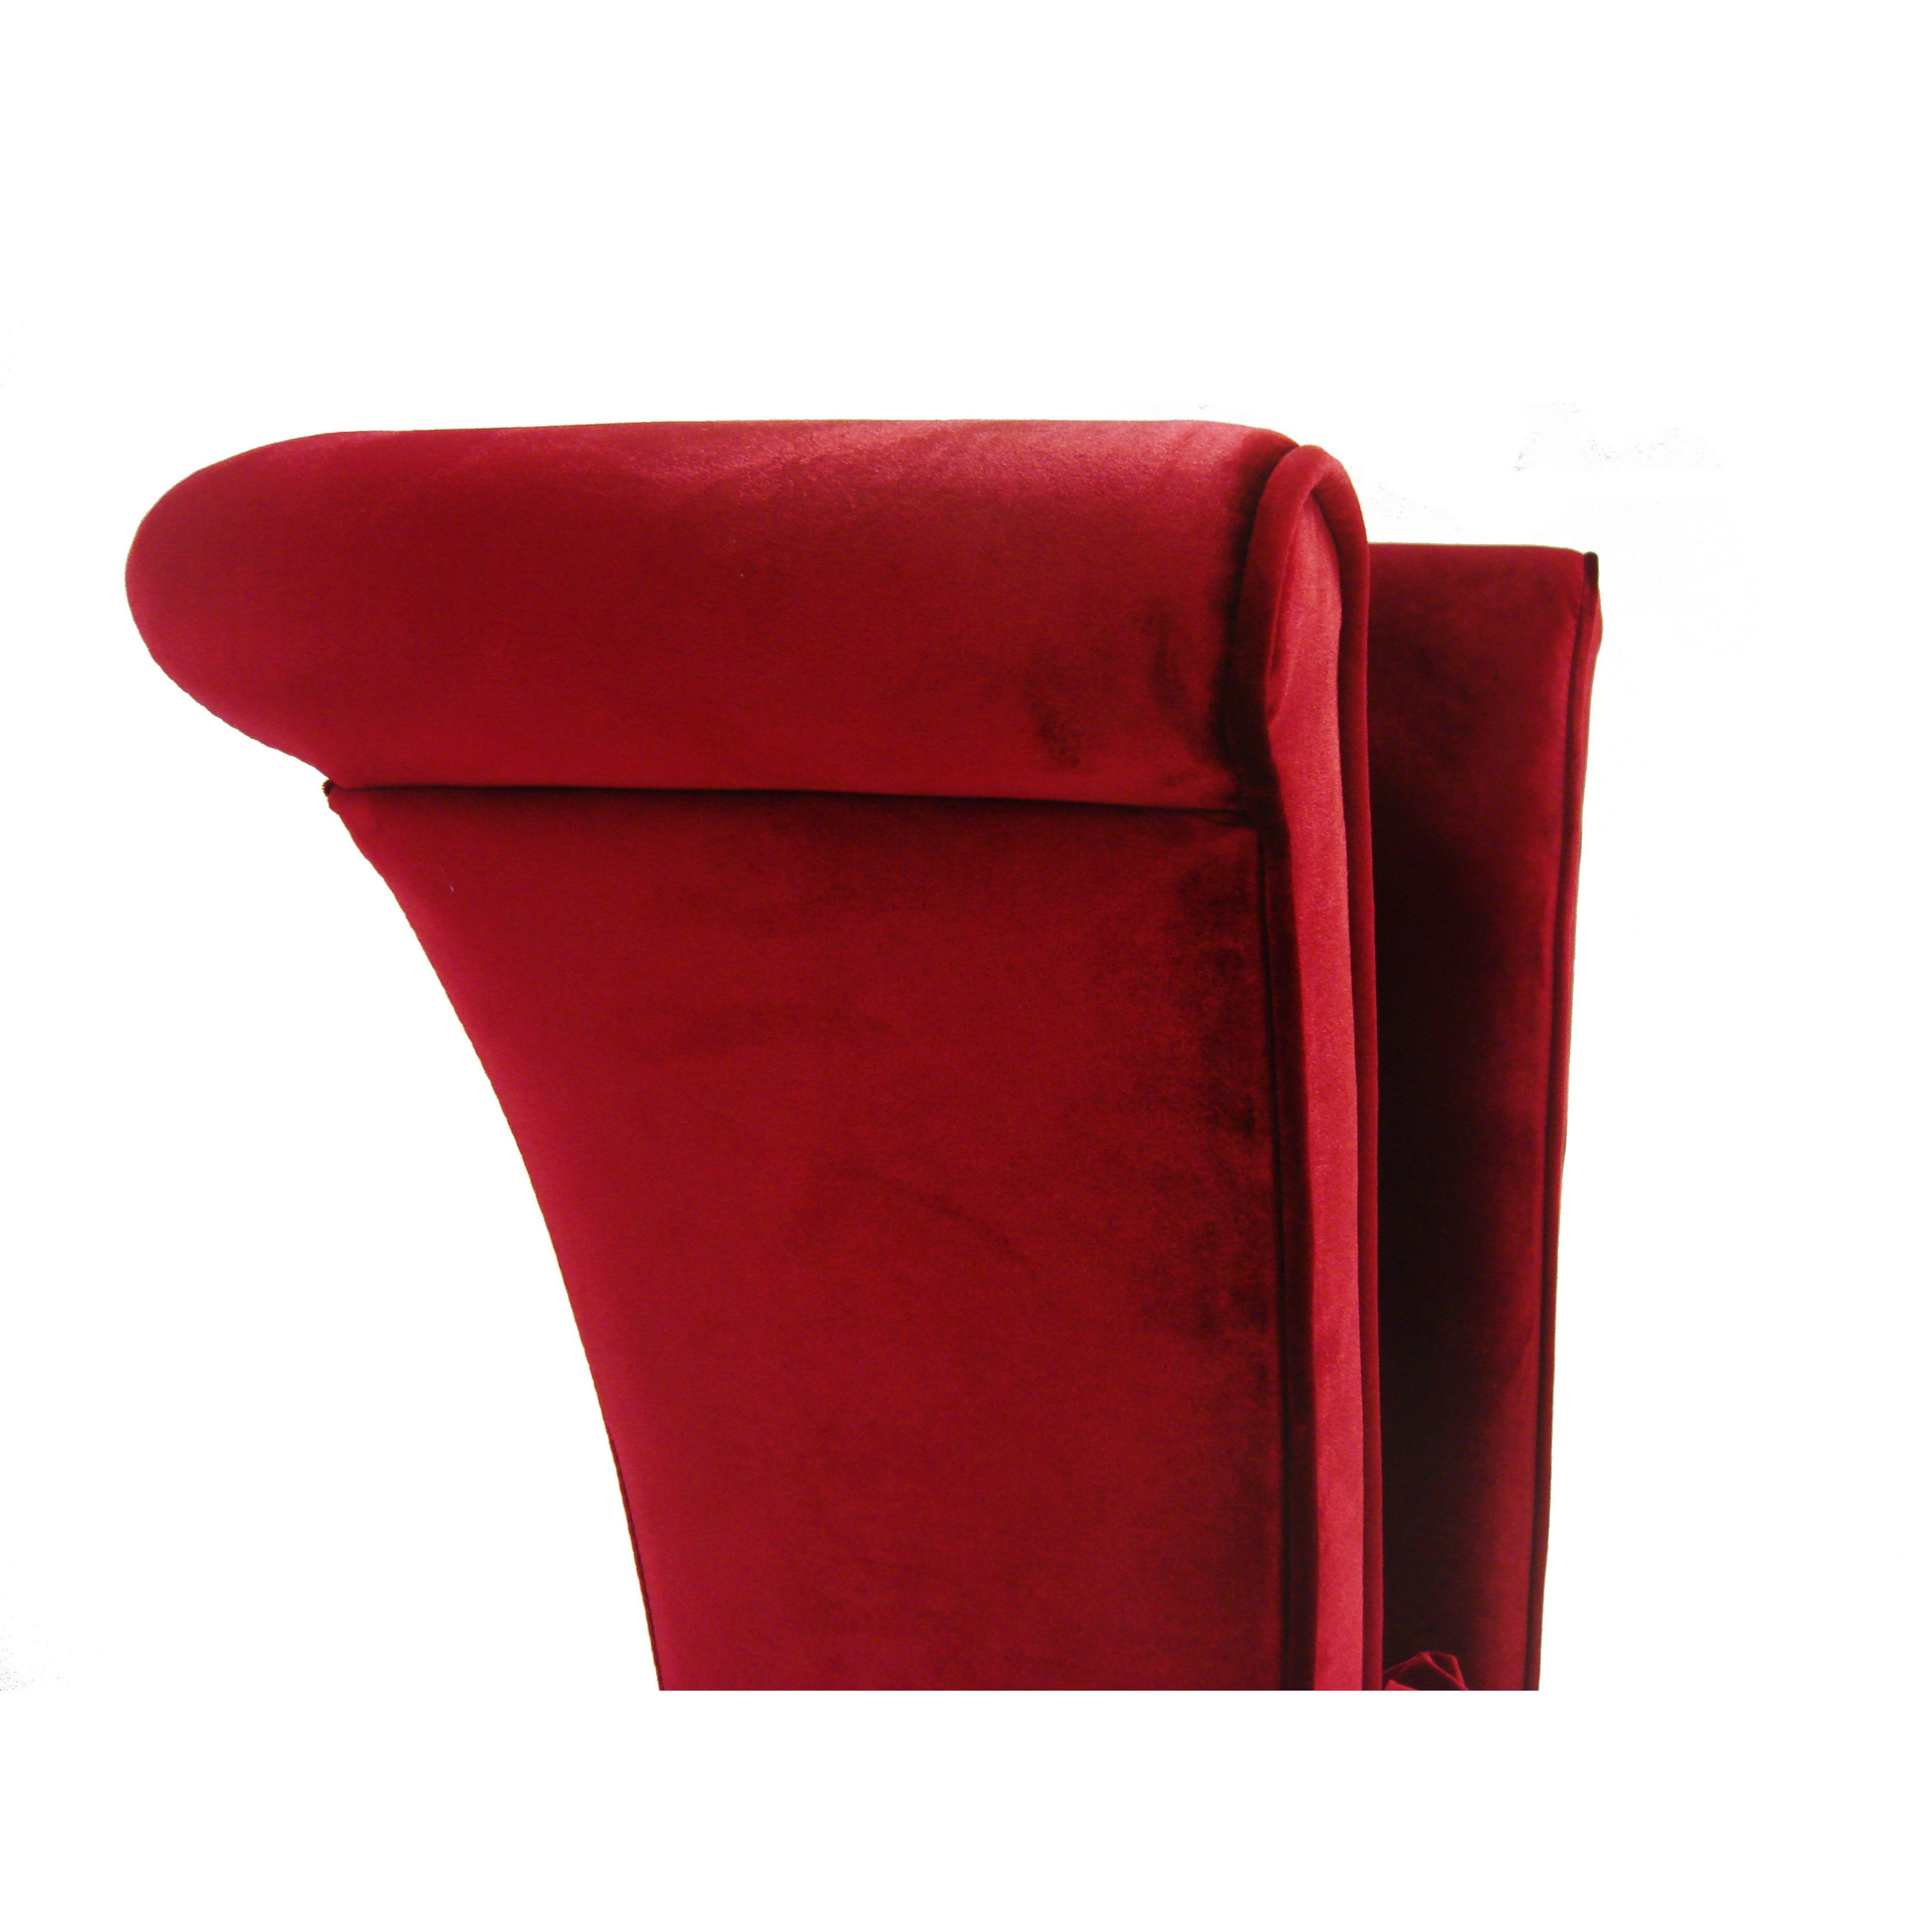 Armen Living Mad Hatter Red Velvet High Back Chair   Free Shipping Today    Overstock.com   14754729